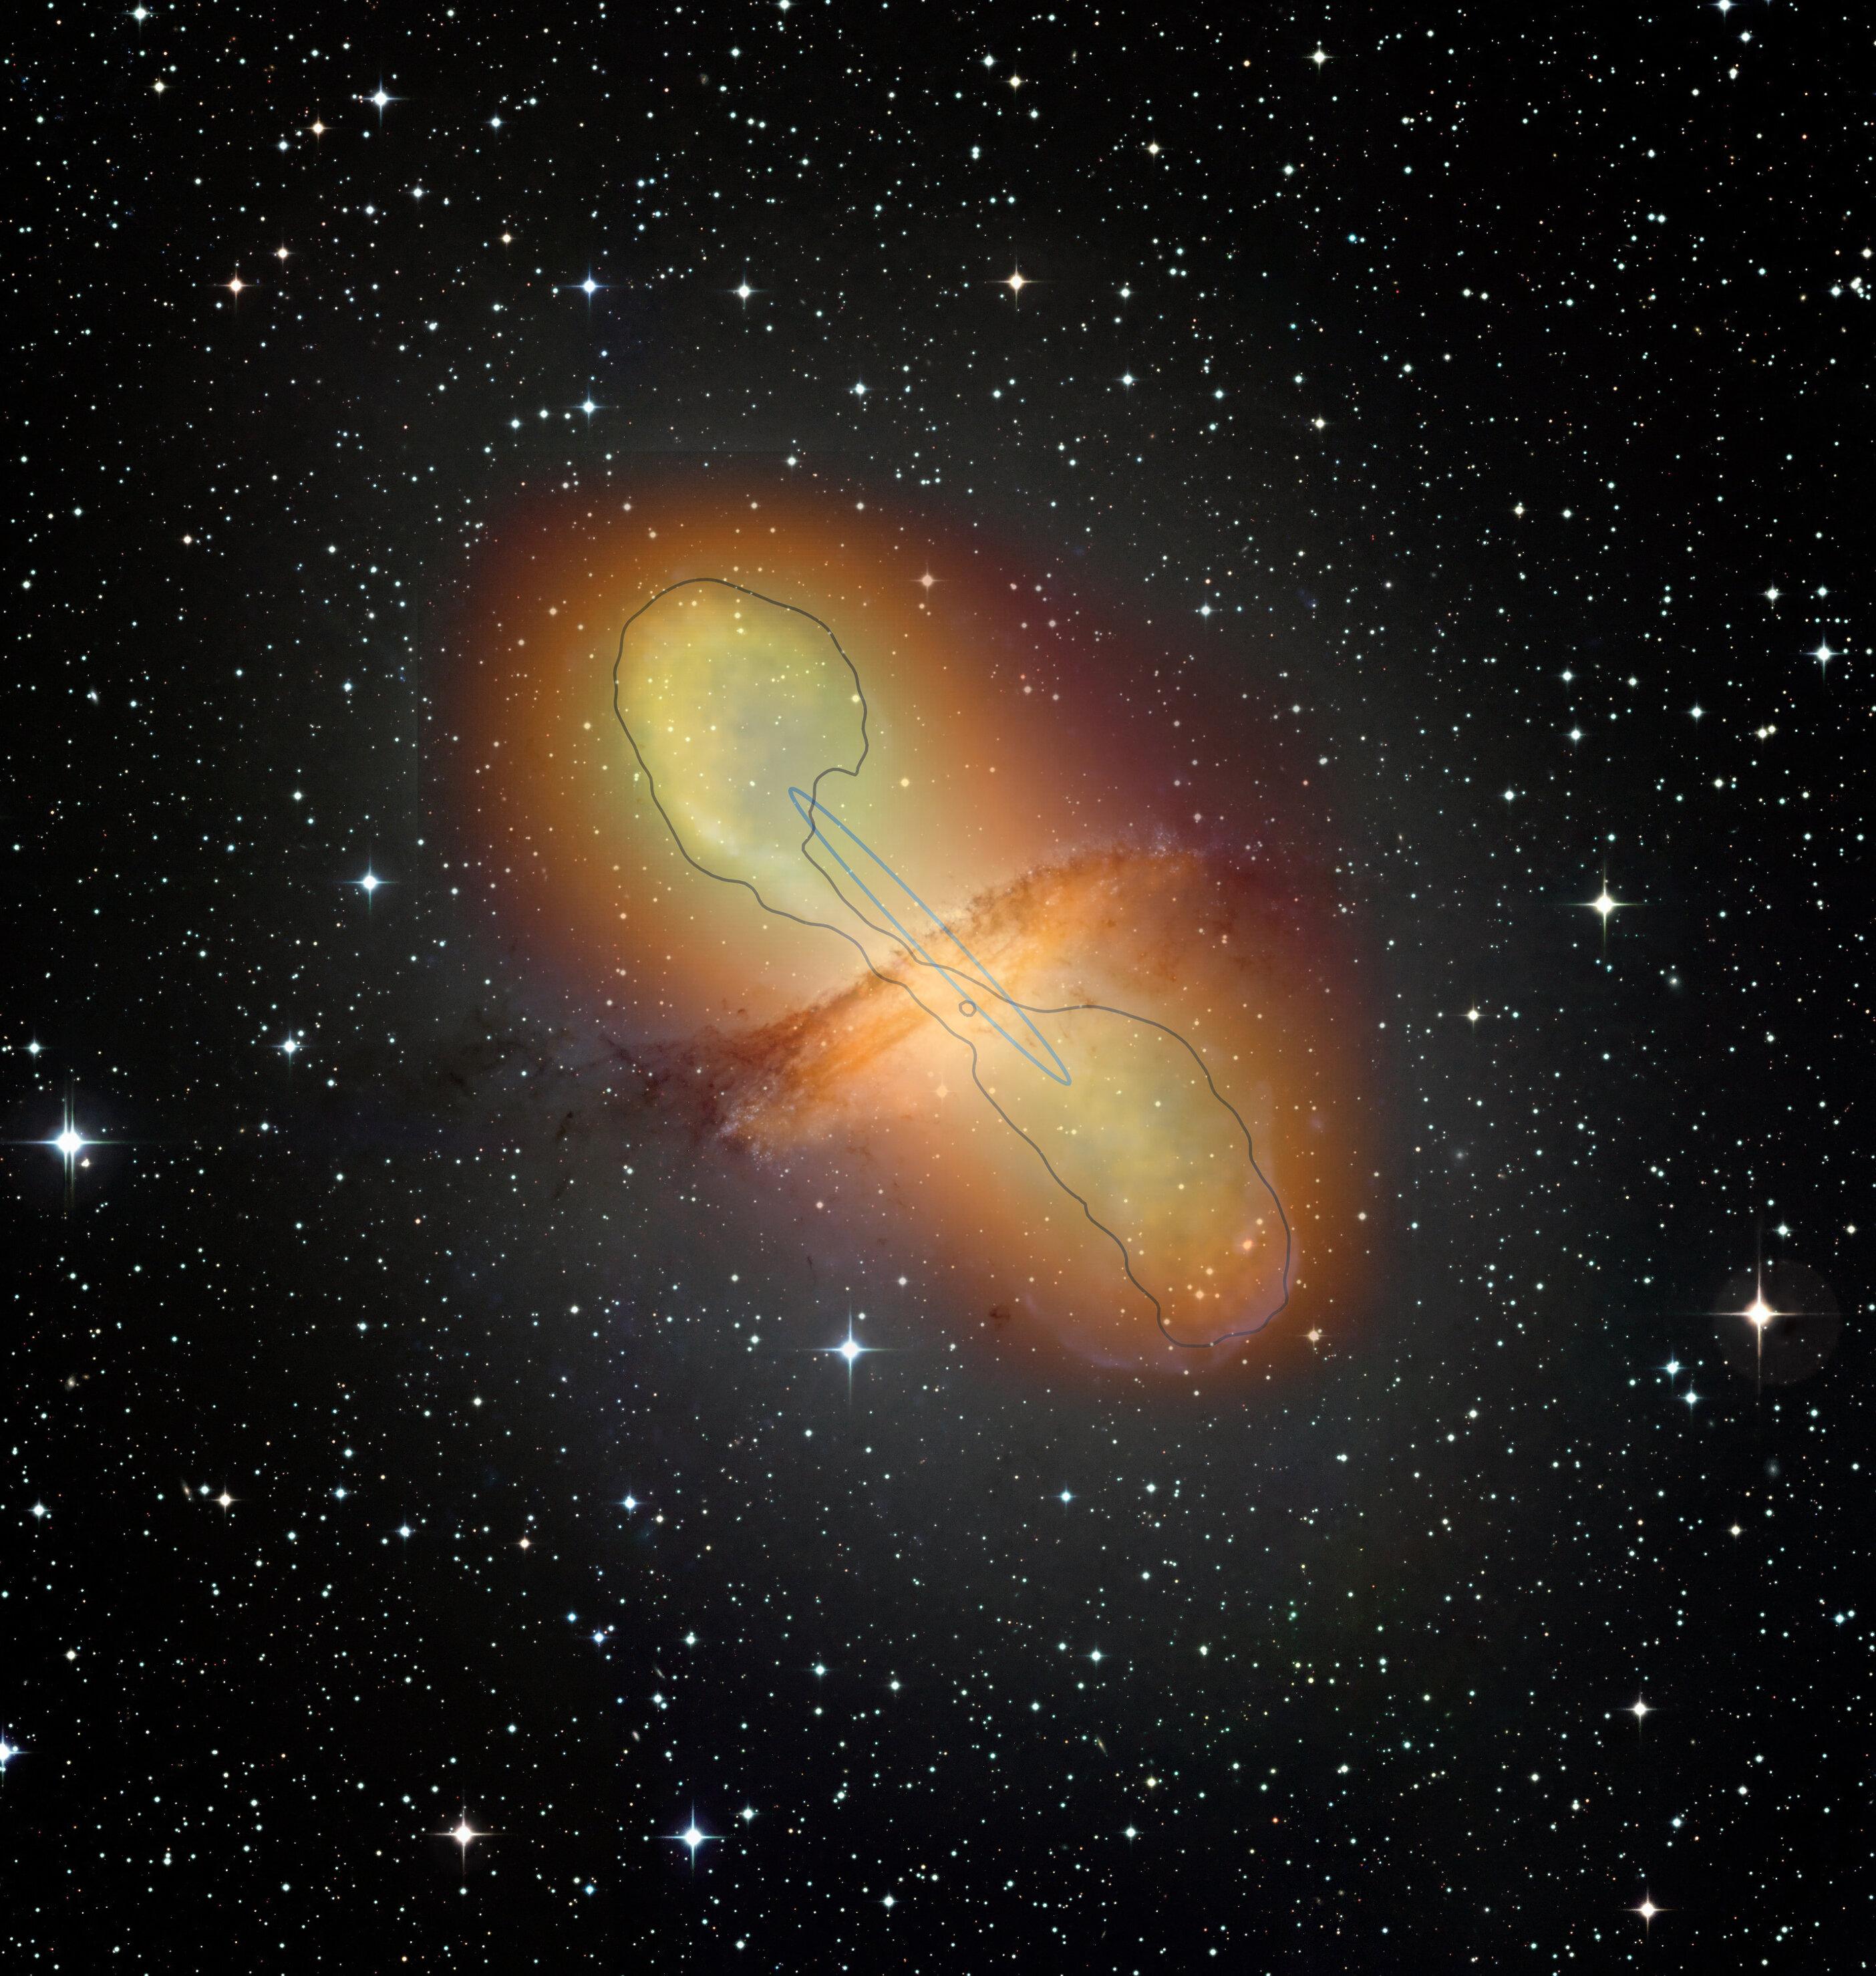 Www.Quasar